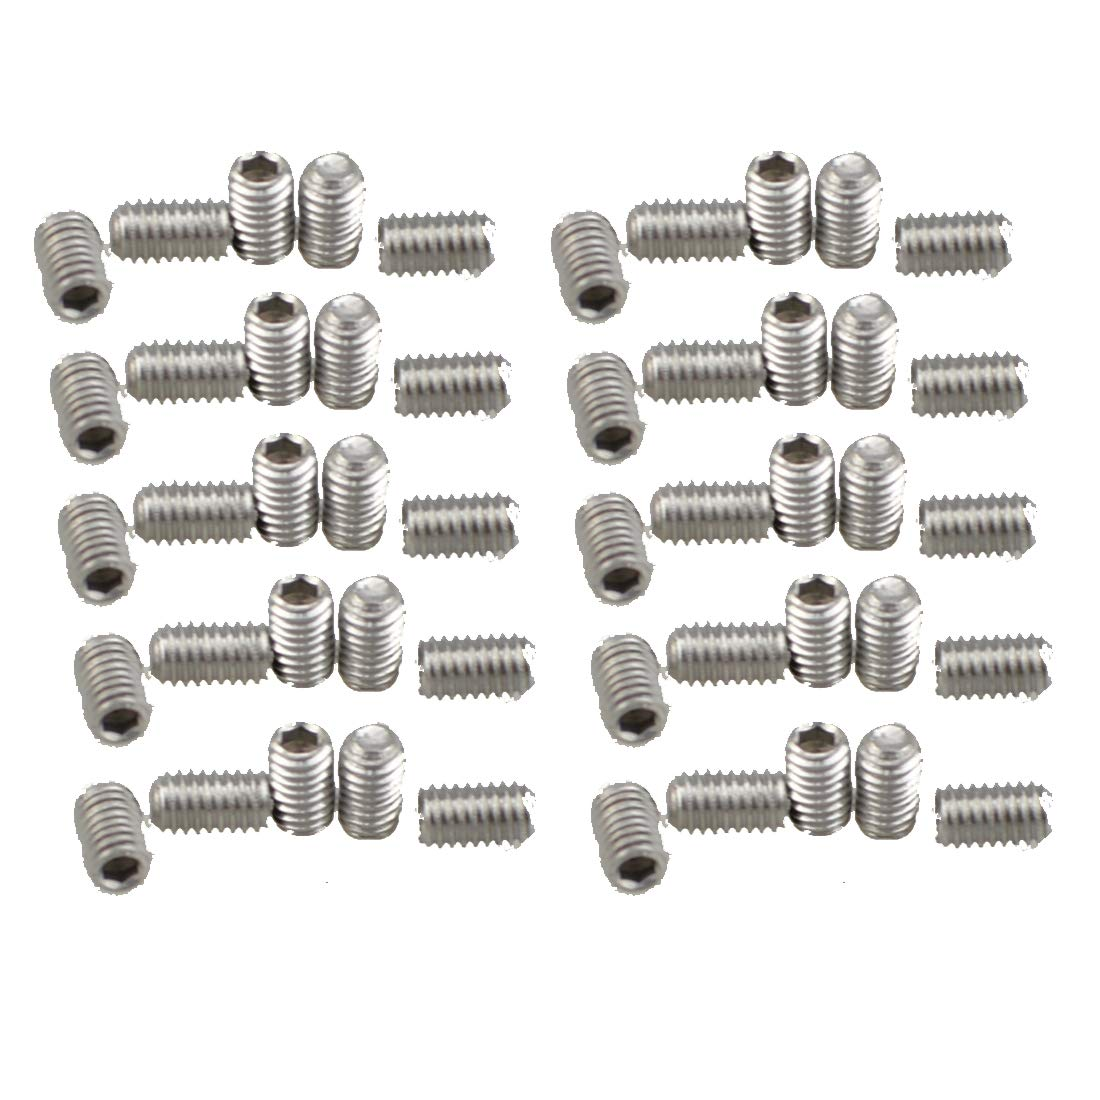 50, M3X8 XunLiu 316 Stainless Steel Internal Hex Socket Cup Point Grub Screw